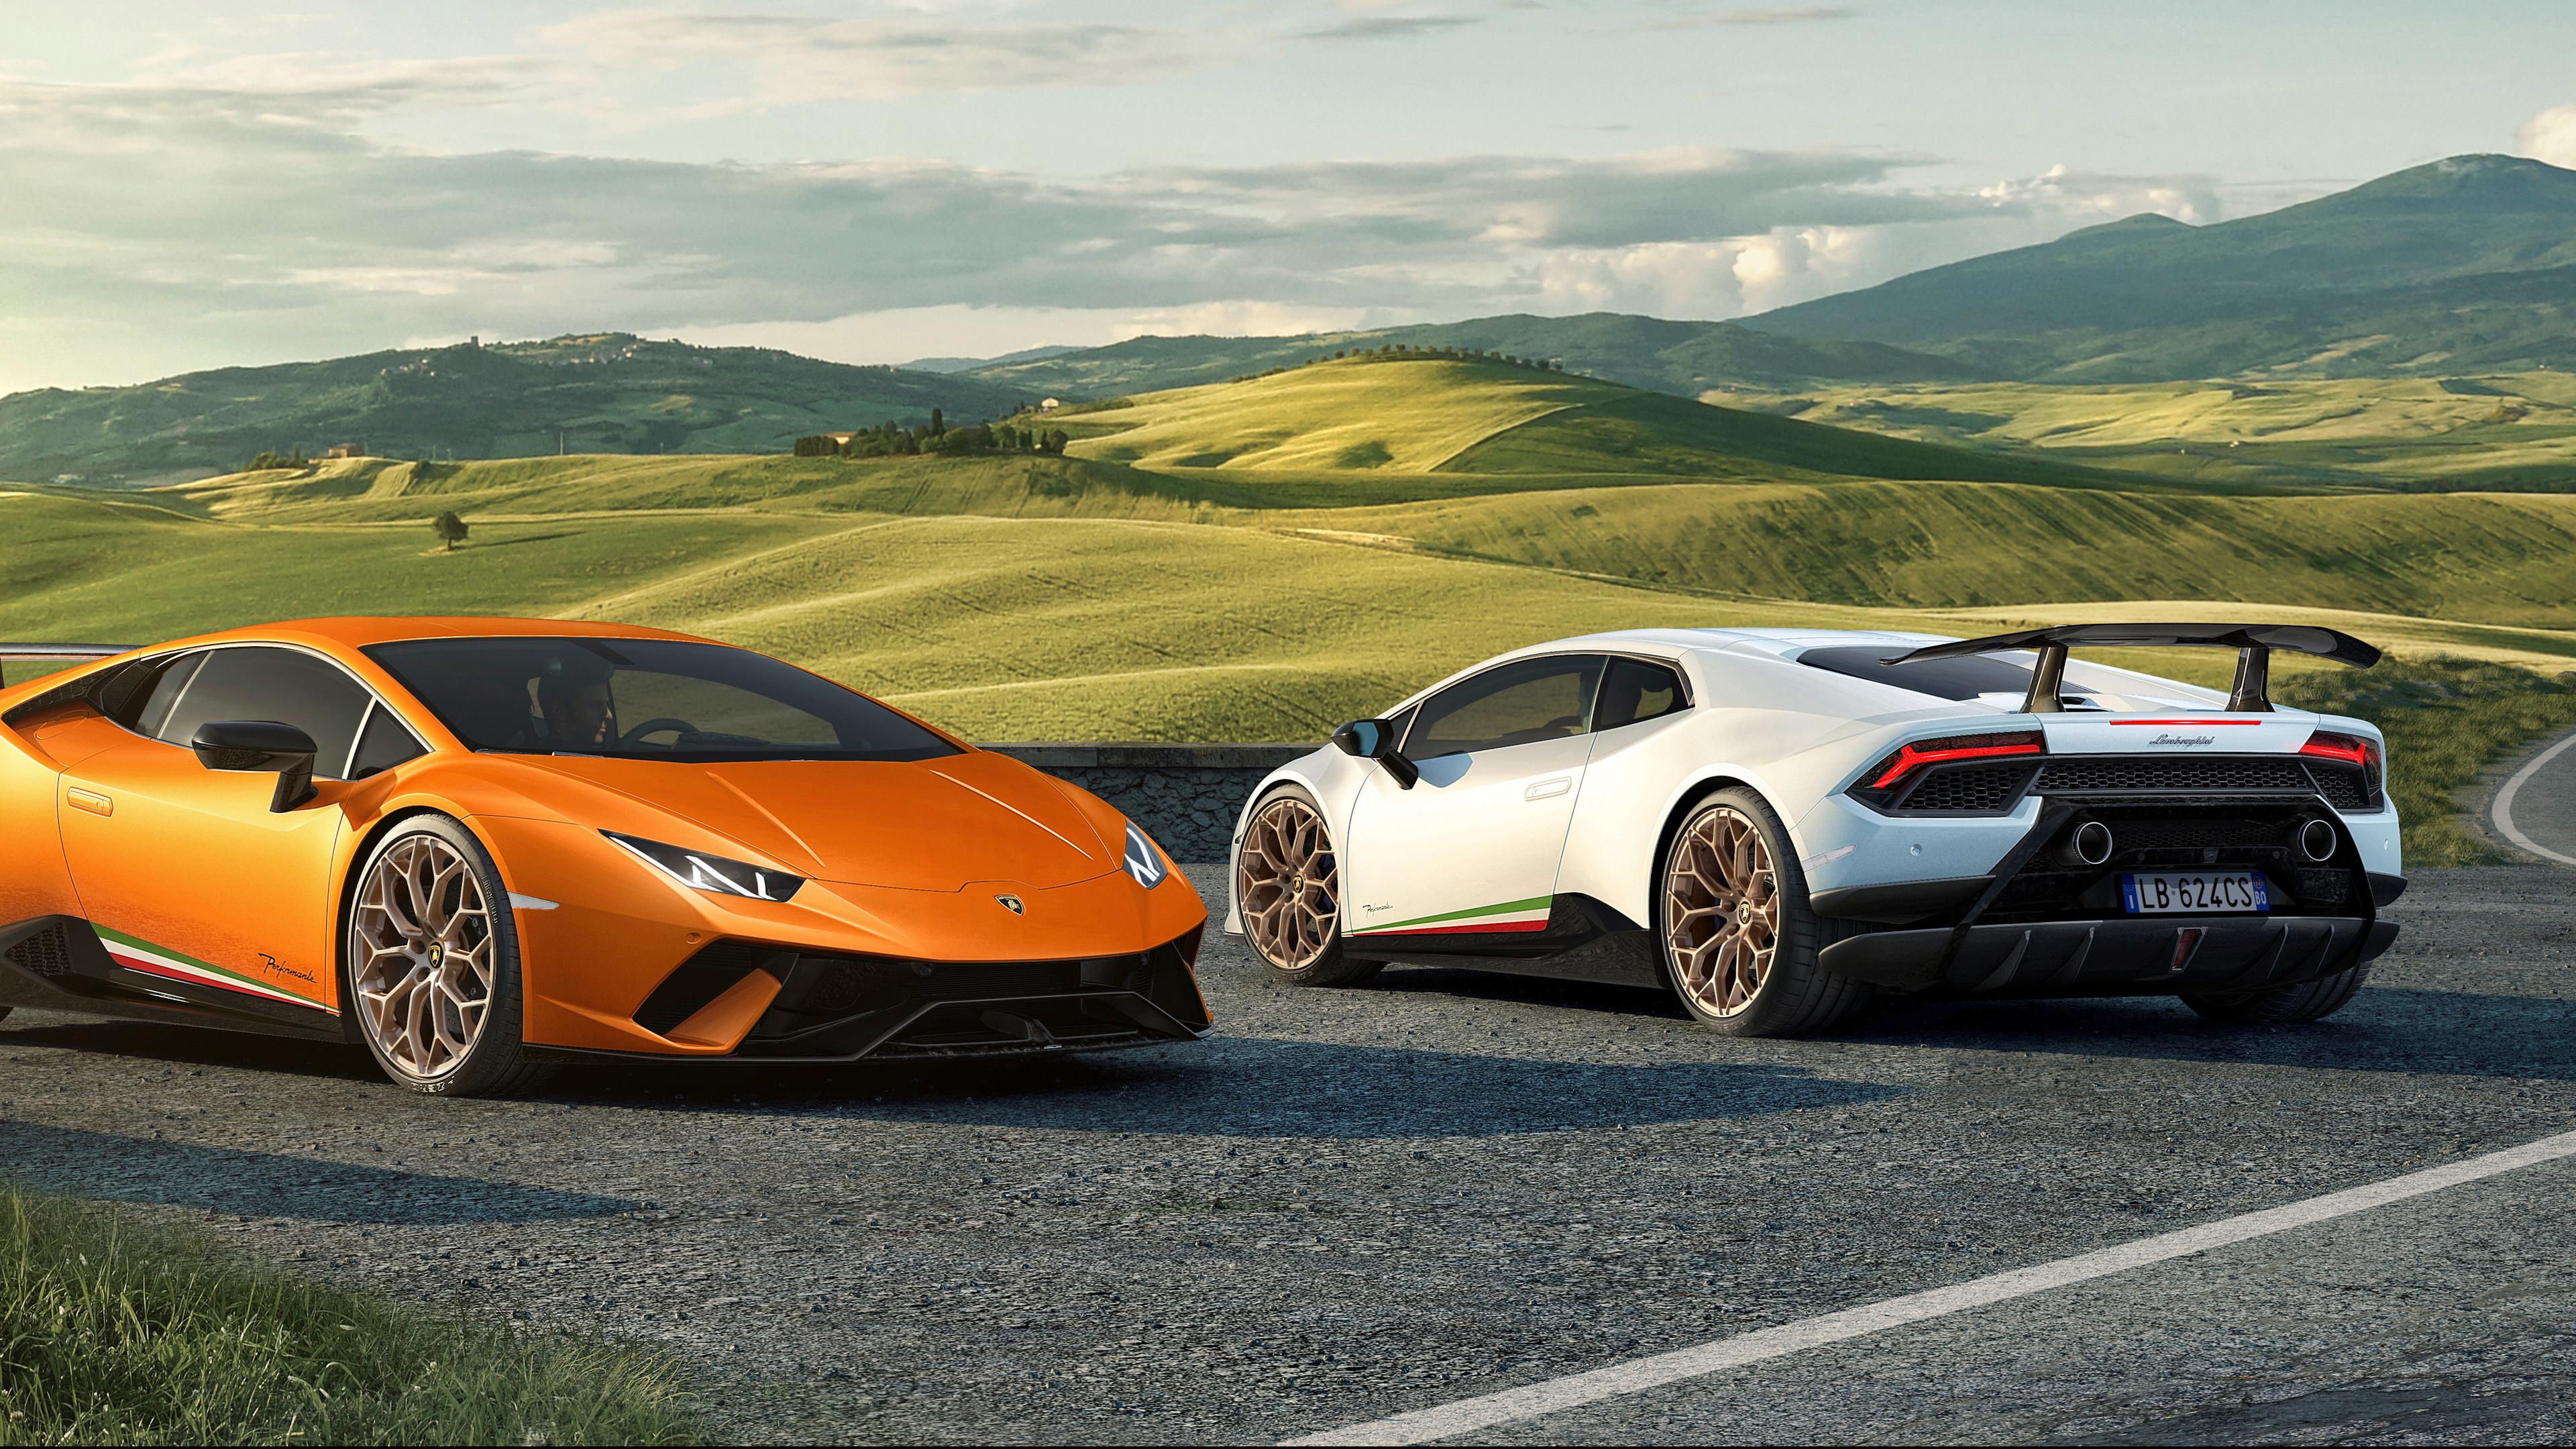 2017 lamborghini huracan performante 5k 1539105122 - 2017 Lamborghini Huracan Performante 5k - lamborghini wallpapers, lamborghini huracan wallpapers, hd-wallpapers, cars wallpapers, 5k wallpapers, 4k-wallpapers